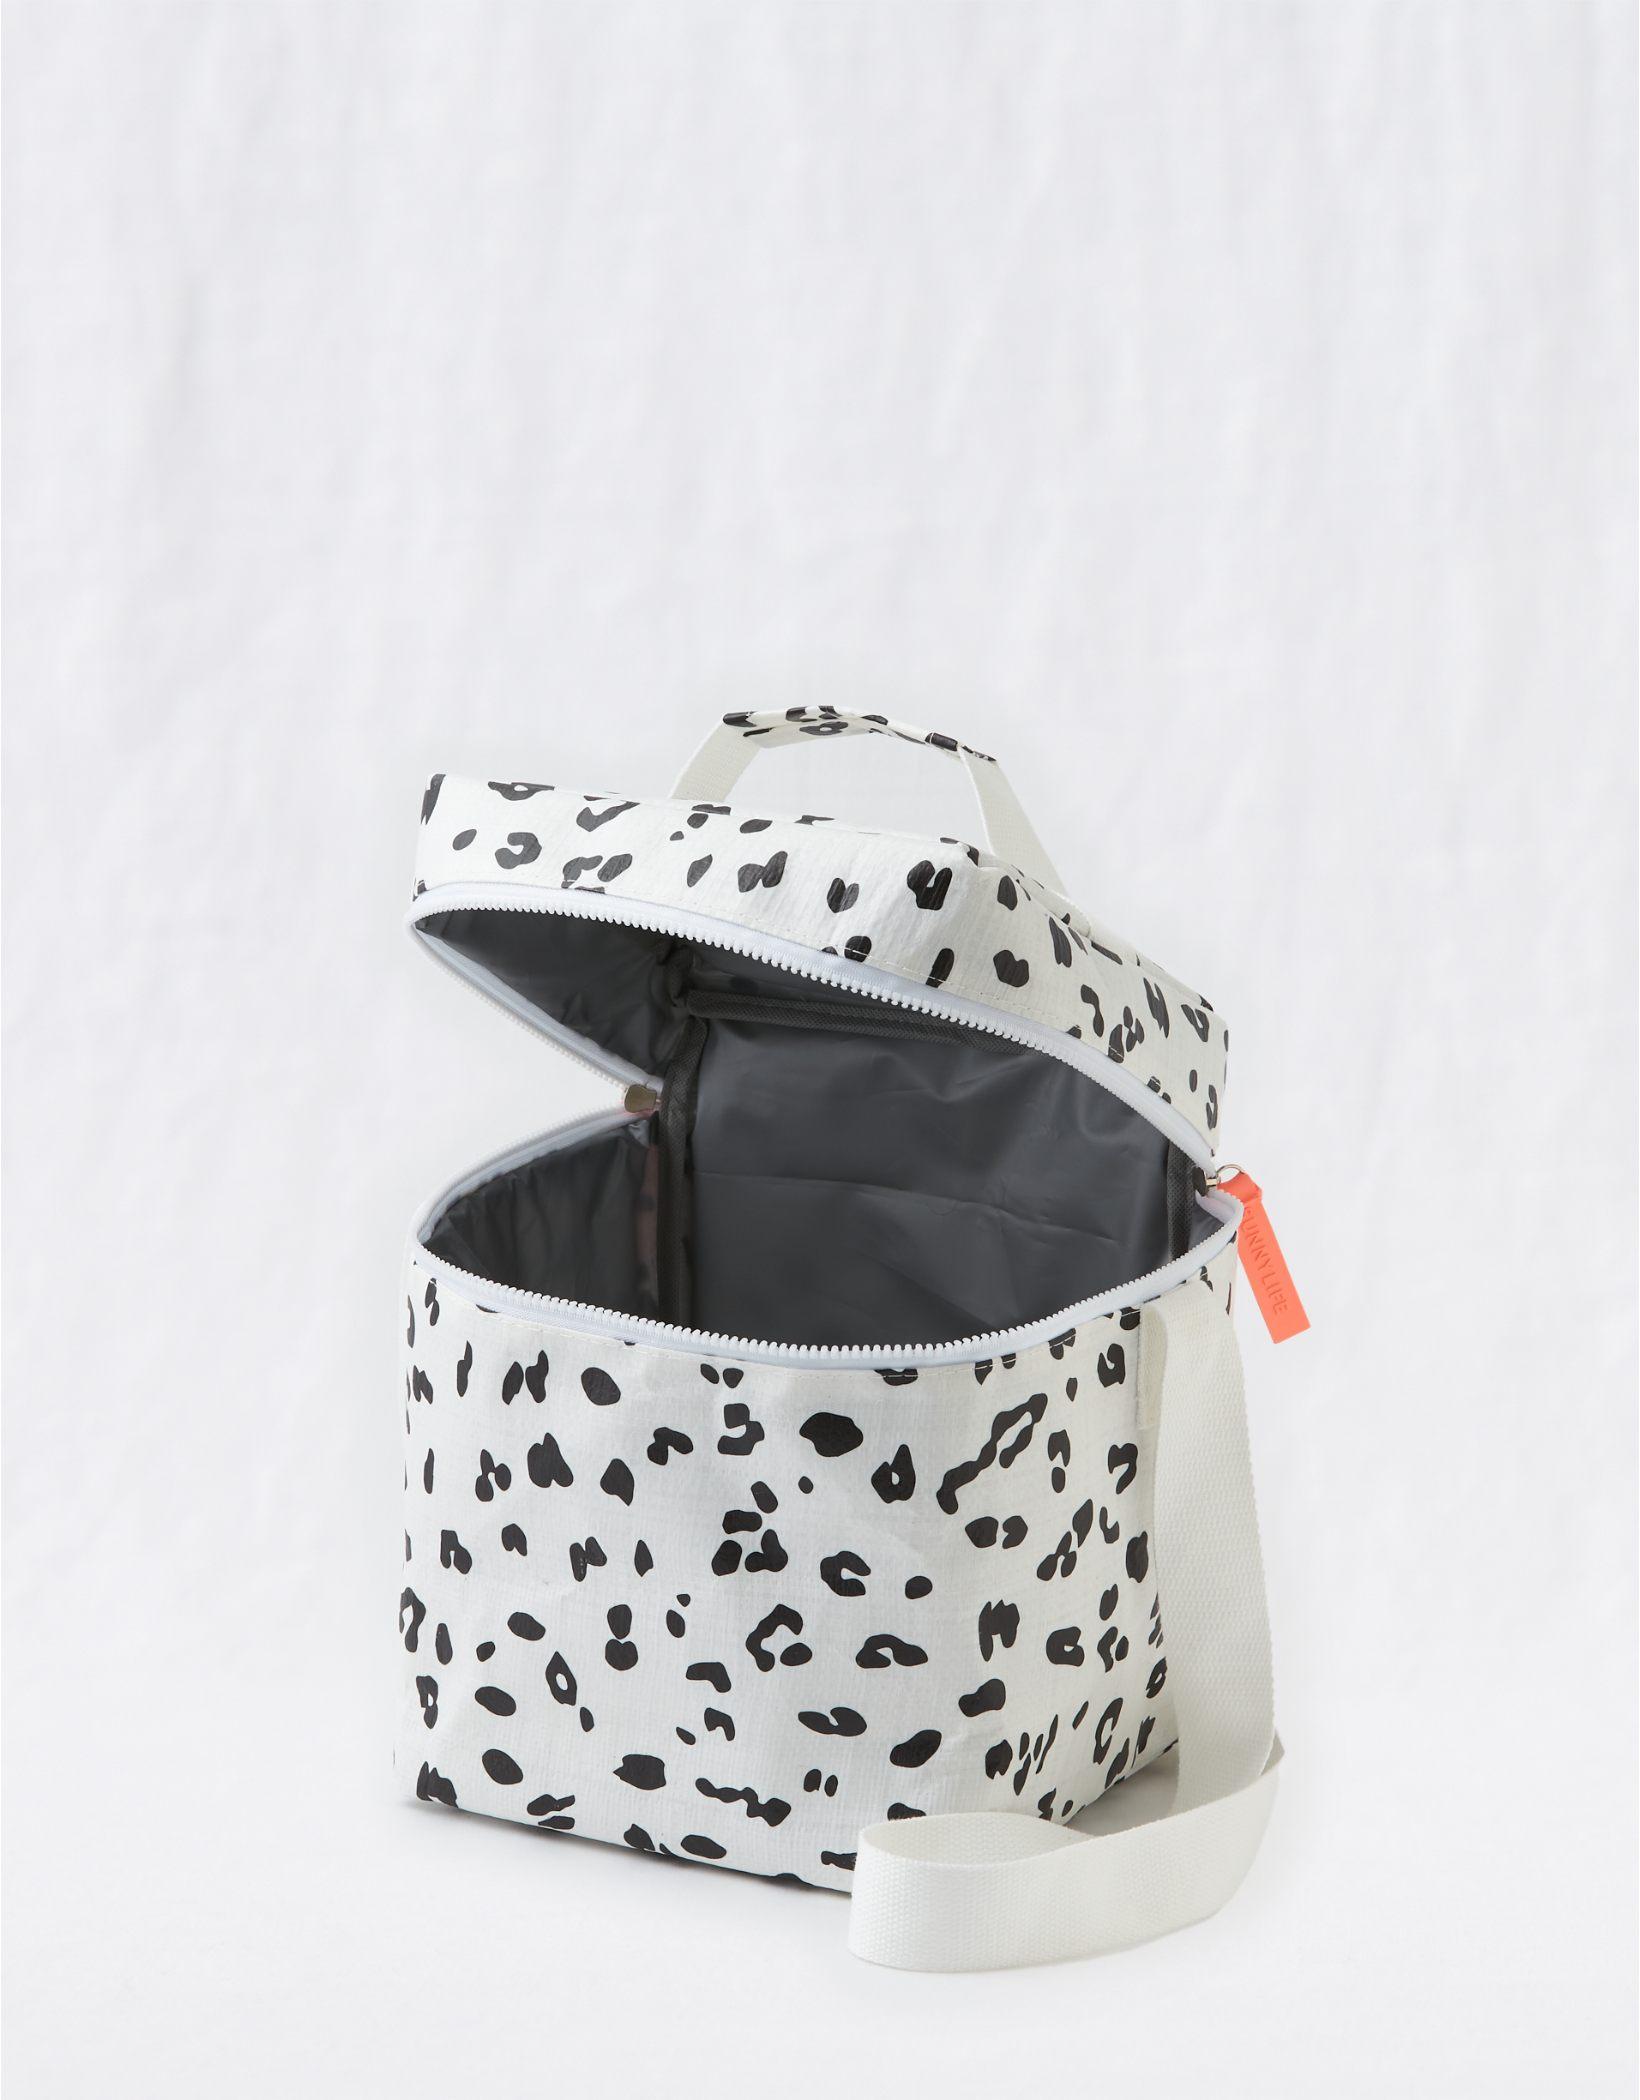 SunnyLife Eco Cooler Bag